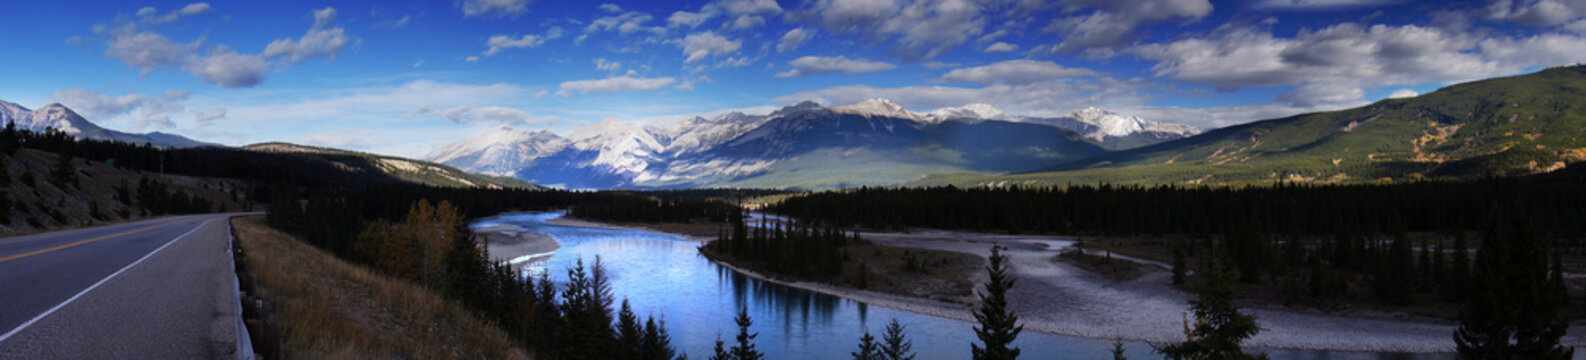 Beautiful Canadian Landscape, Alberta, Canada